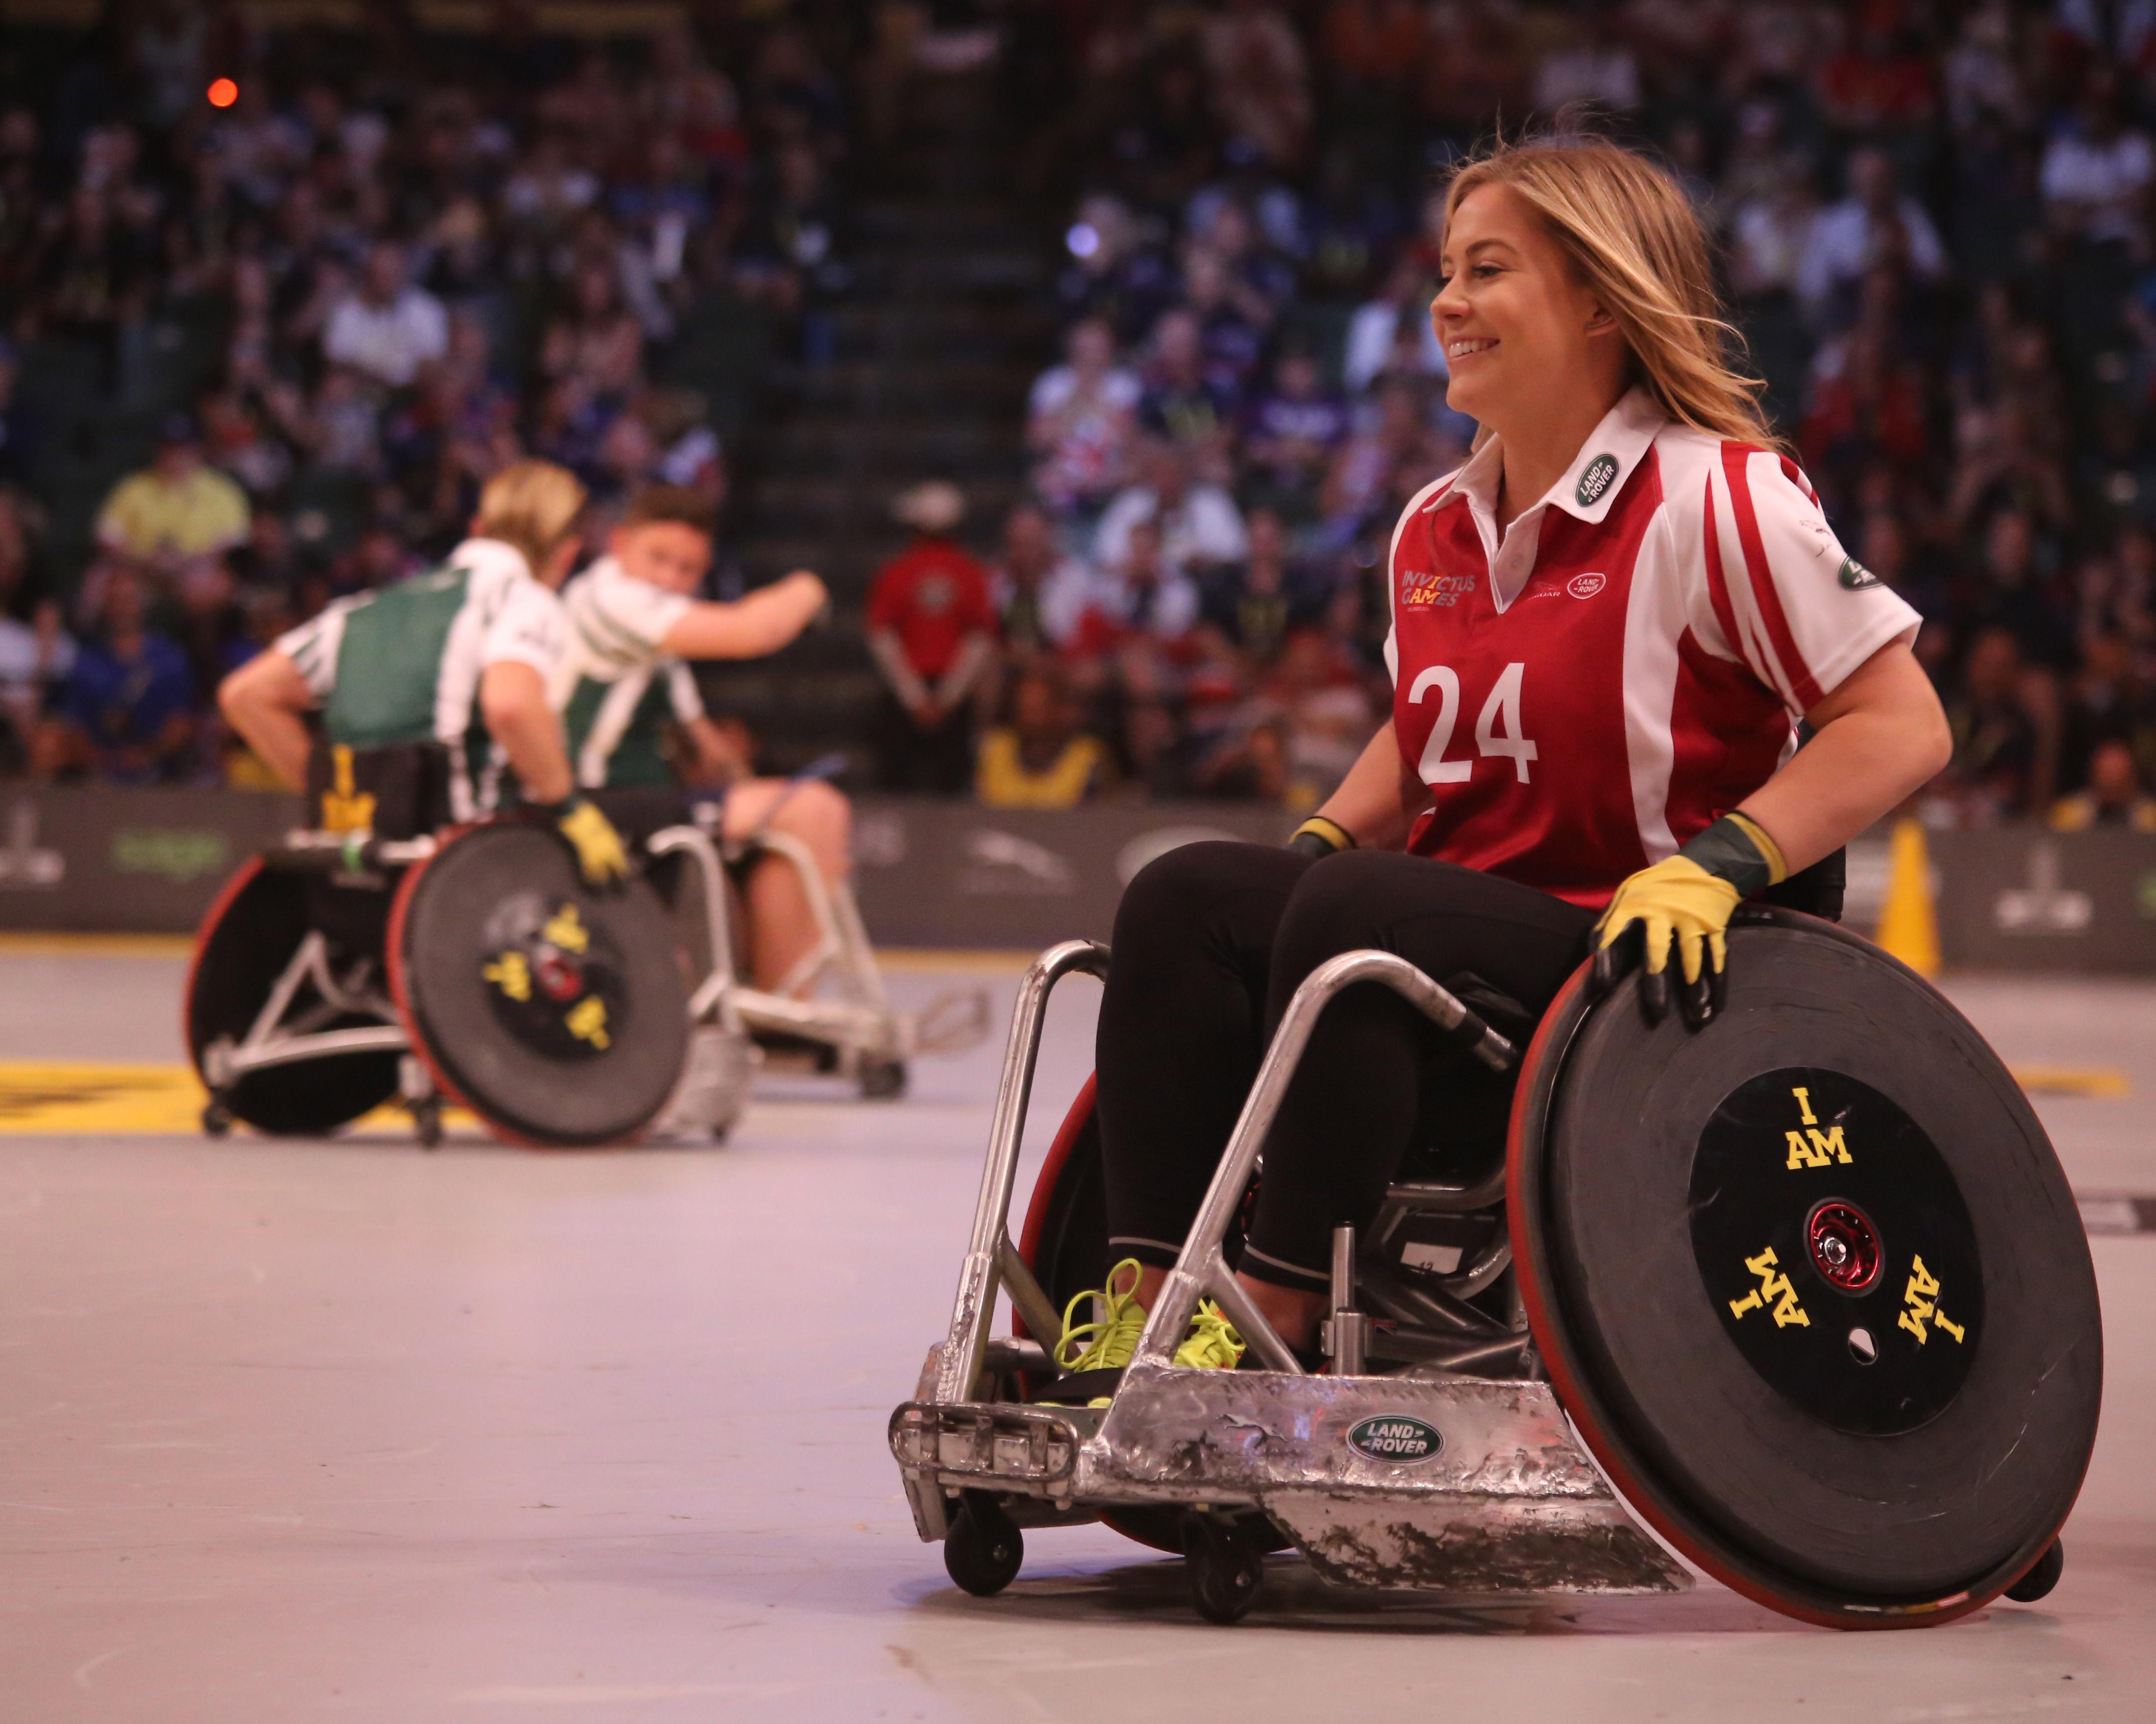 Знаменитые инвалиды картинки